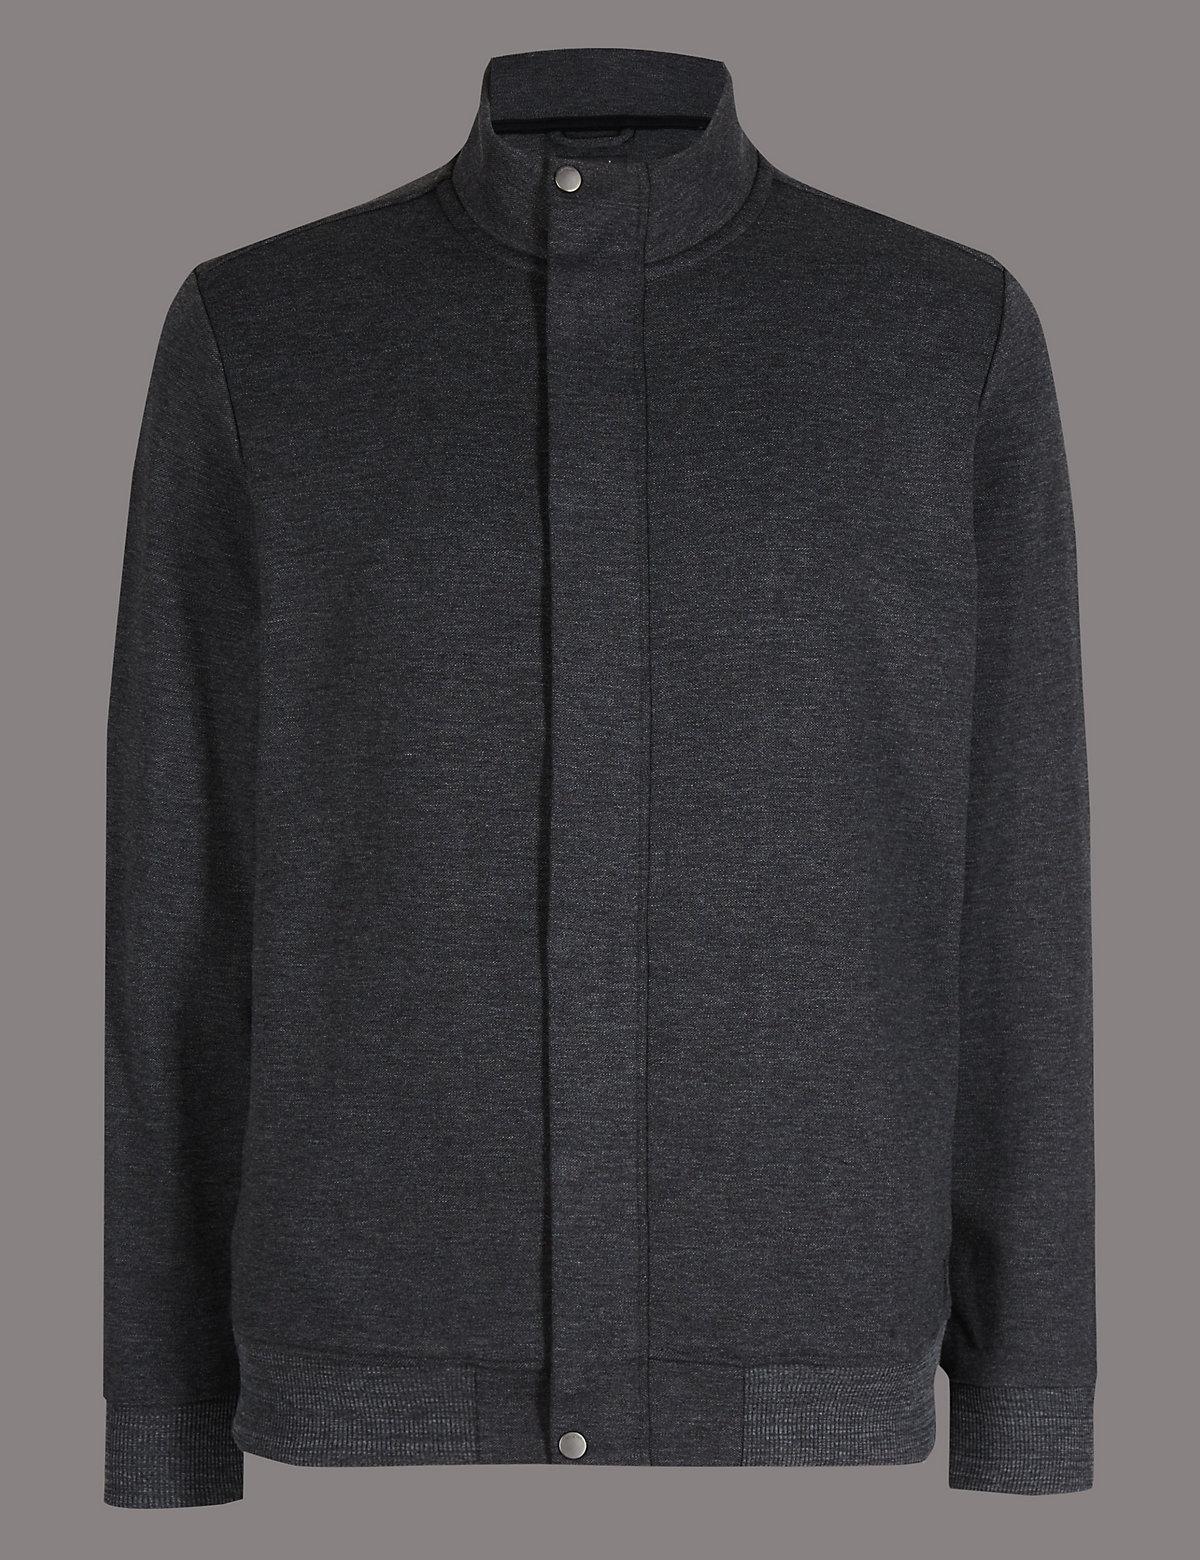 Autograph Cotton Rich Zipped Through Sweatshirt